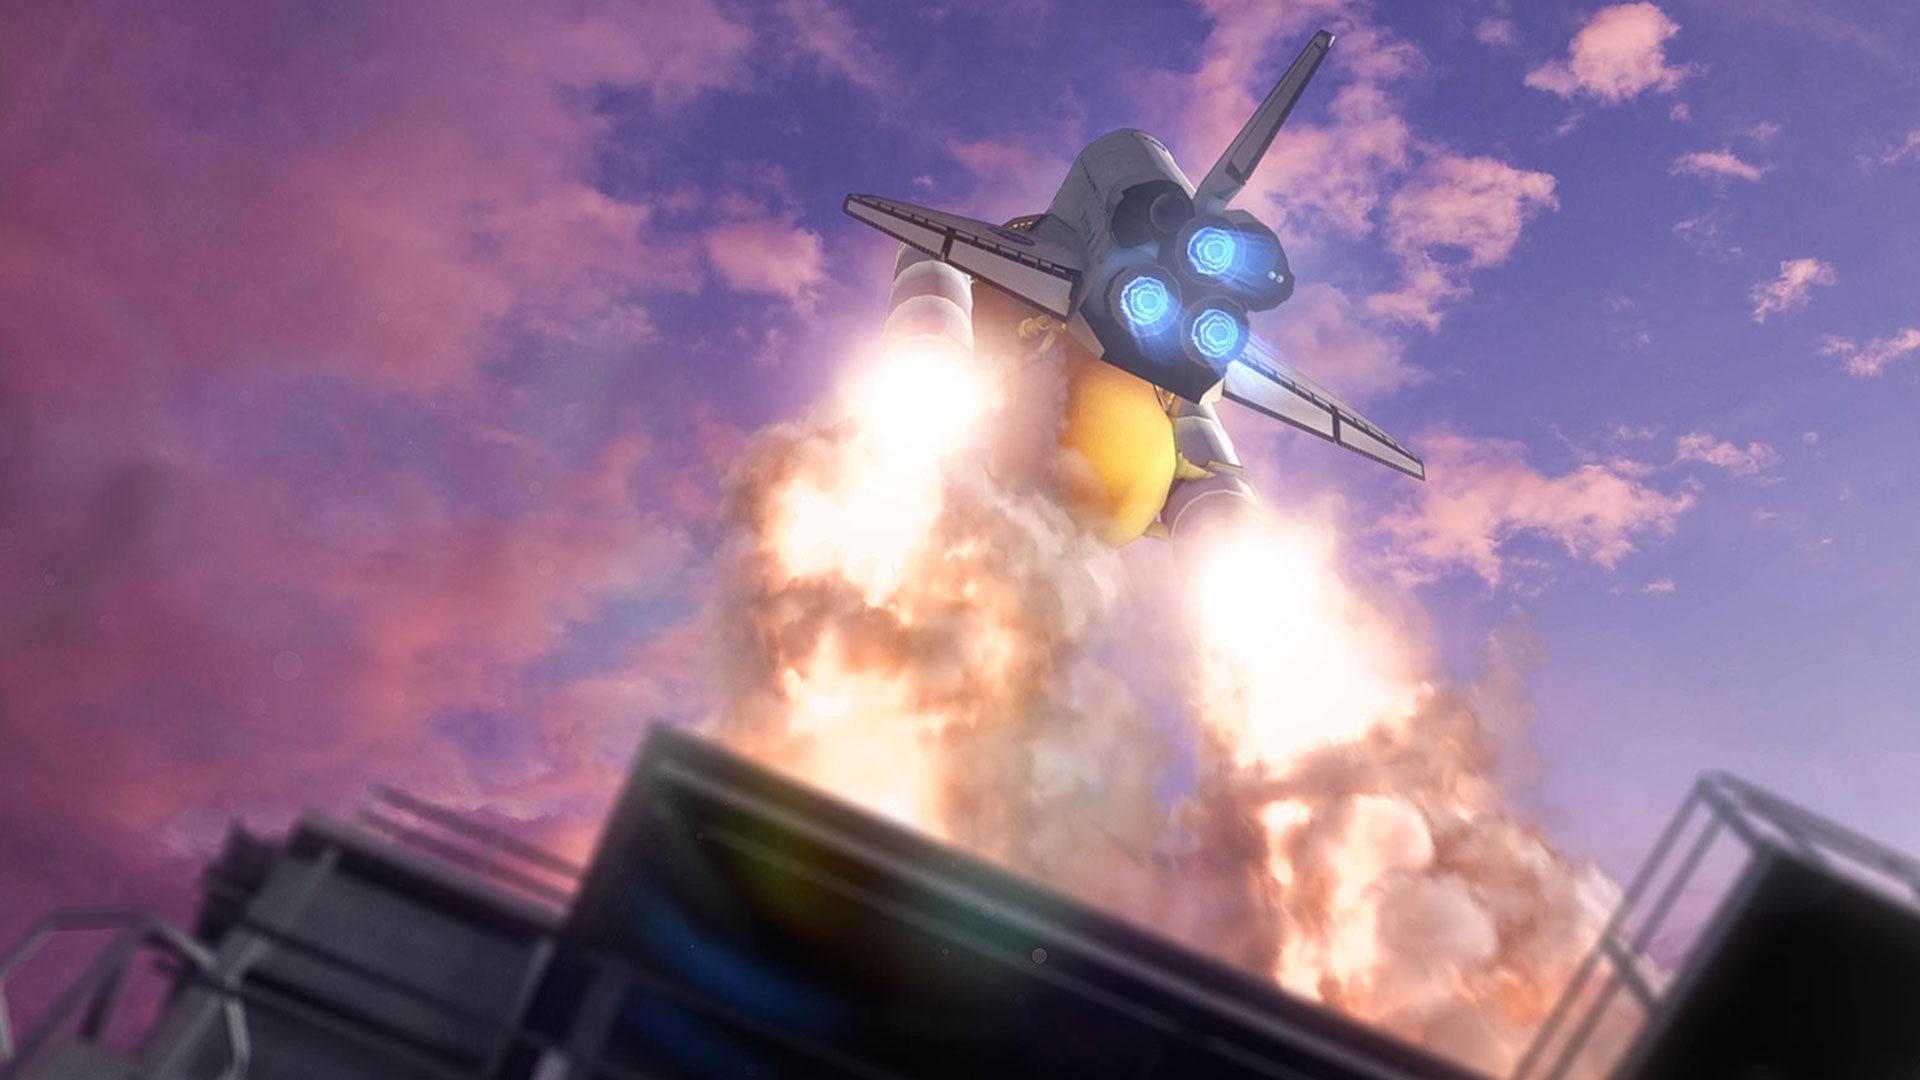 3D space shuttle mockup